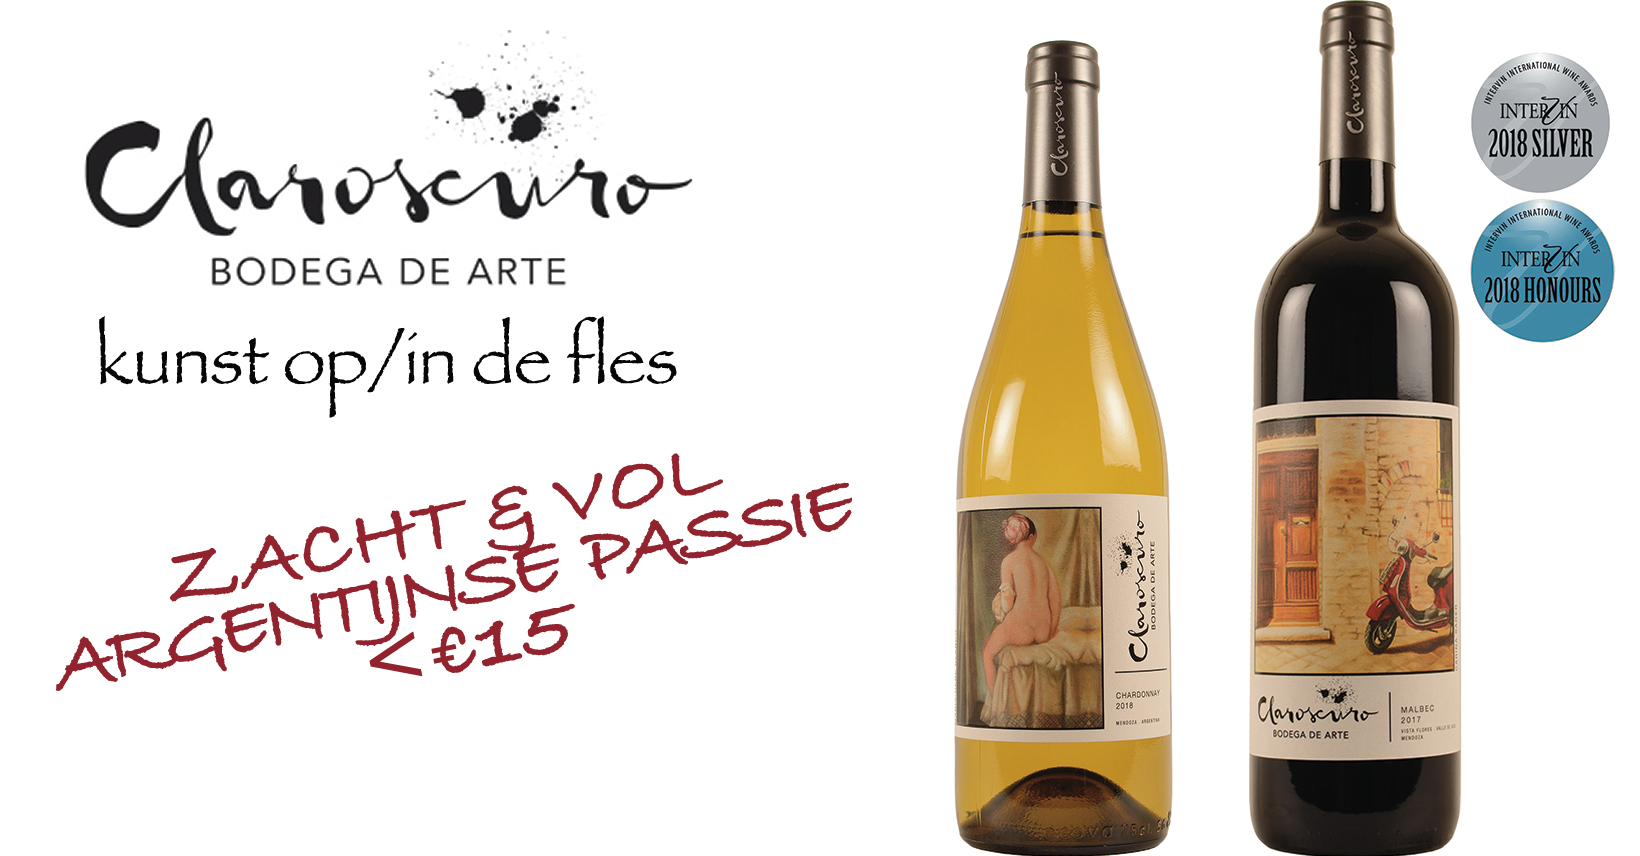 claroscuro Promo Argentijnse wijn Argentinië